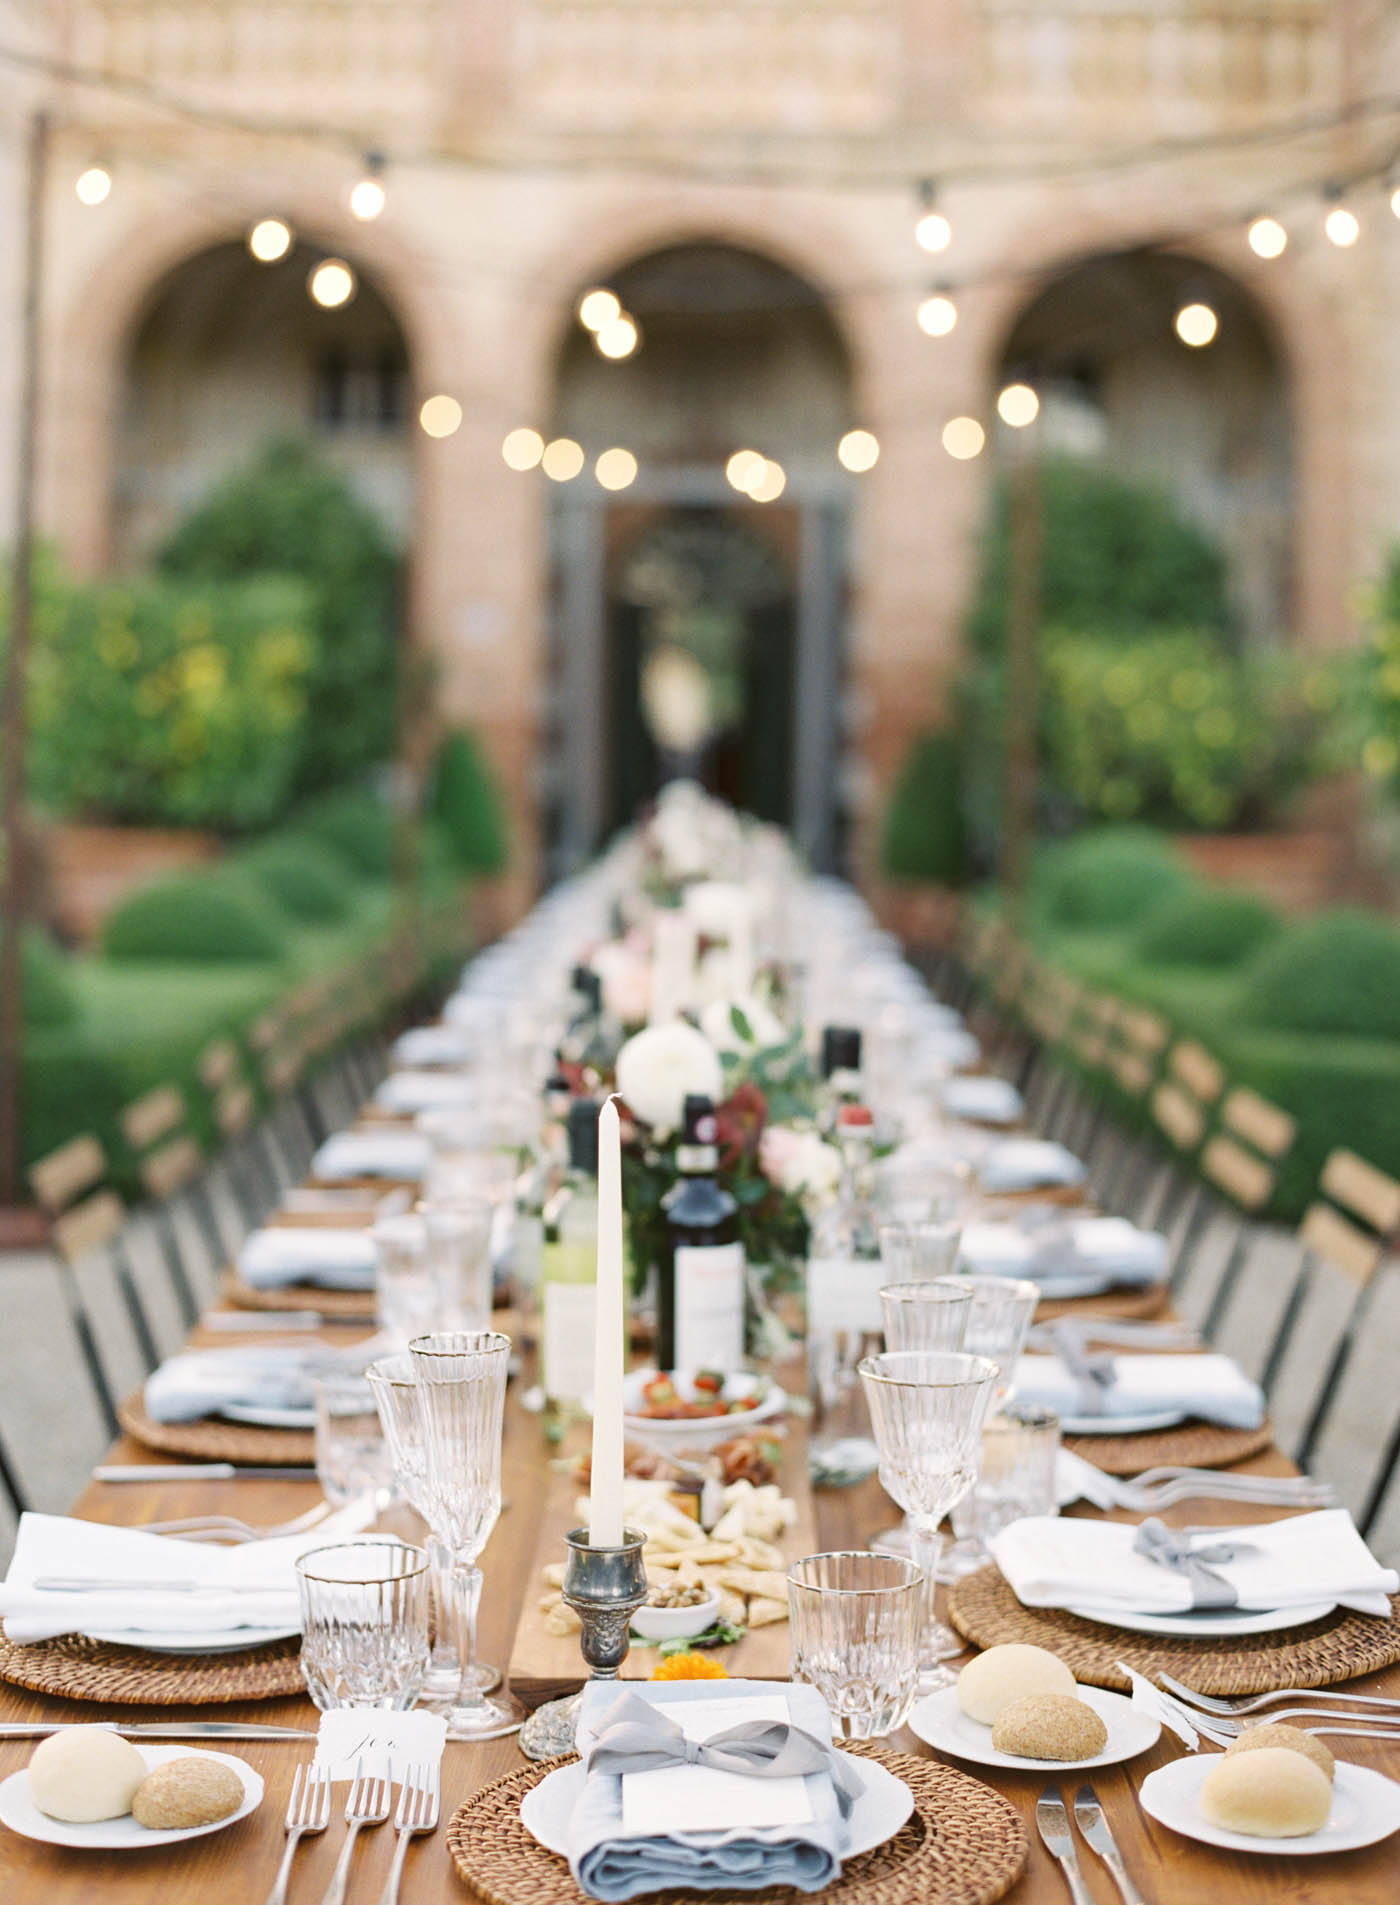 Villa_Cetinale_Wedding-52-Jen_Huang-ElanJacob-308-Jen_Huang-007302-R1-016.jpg